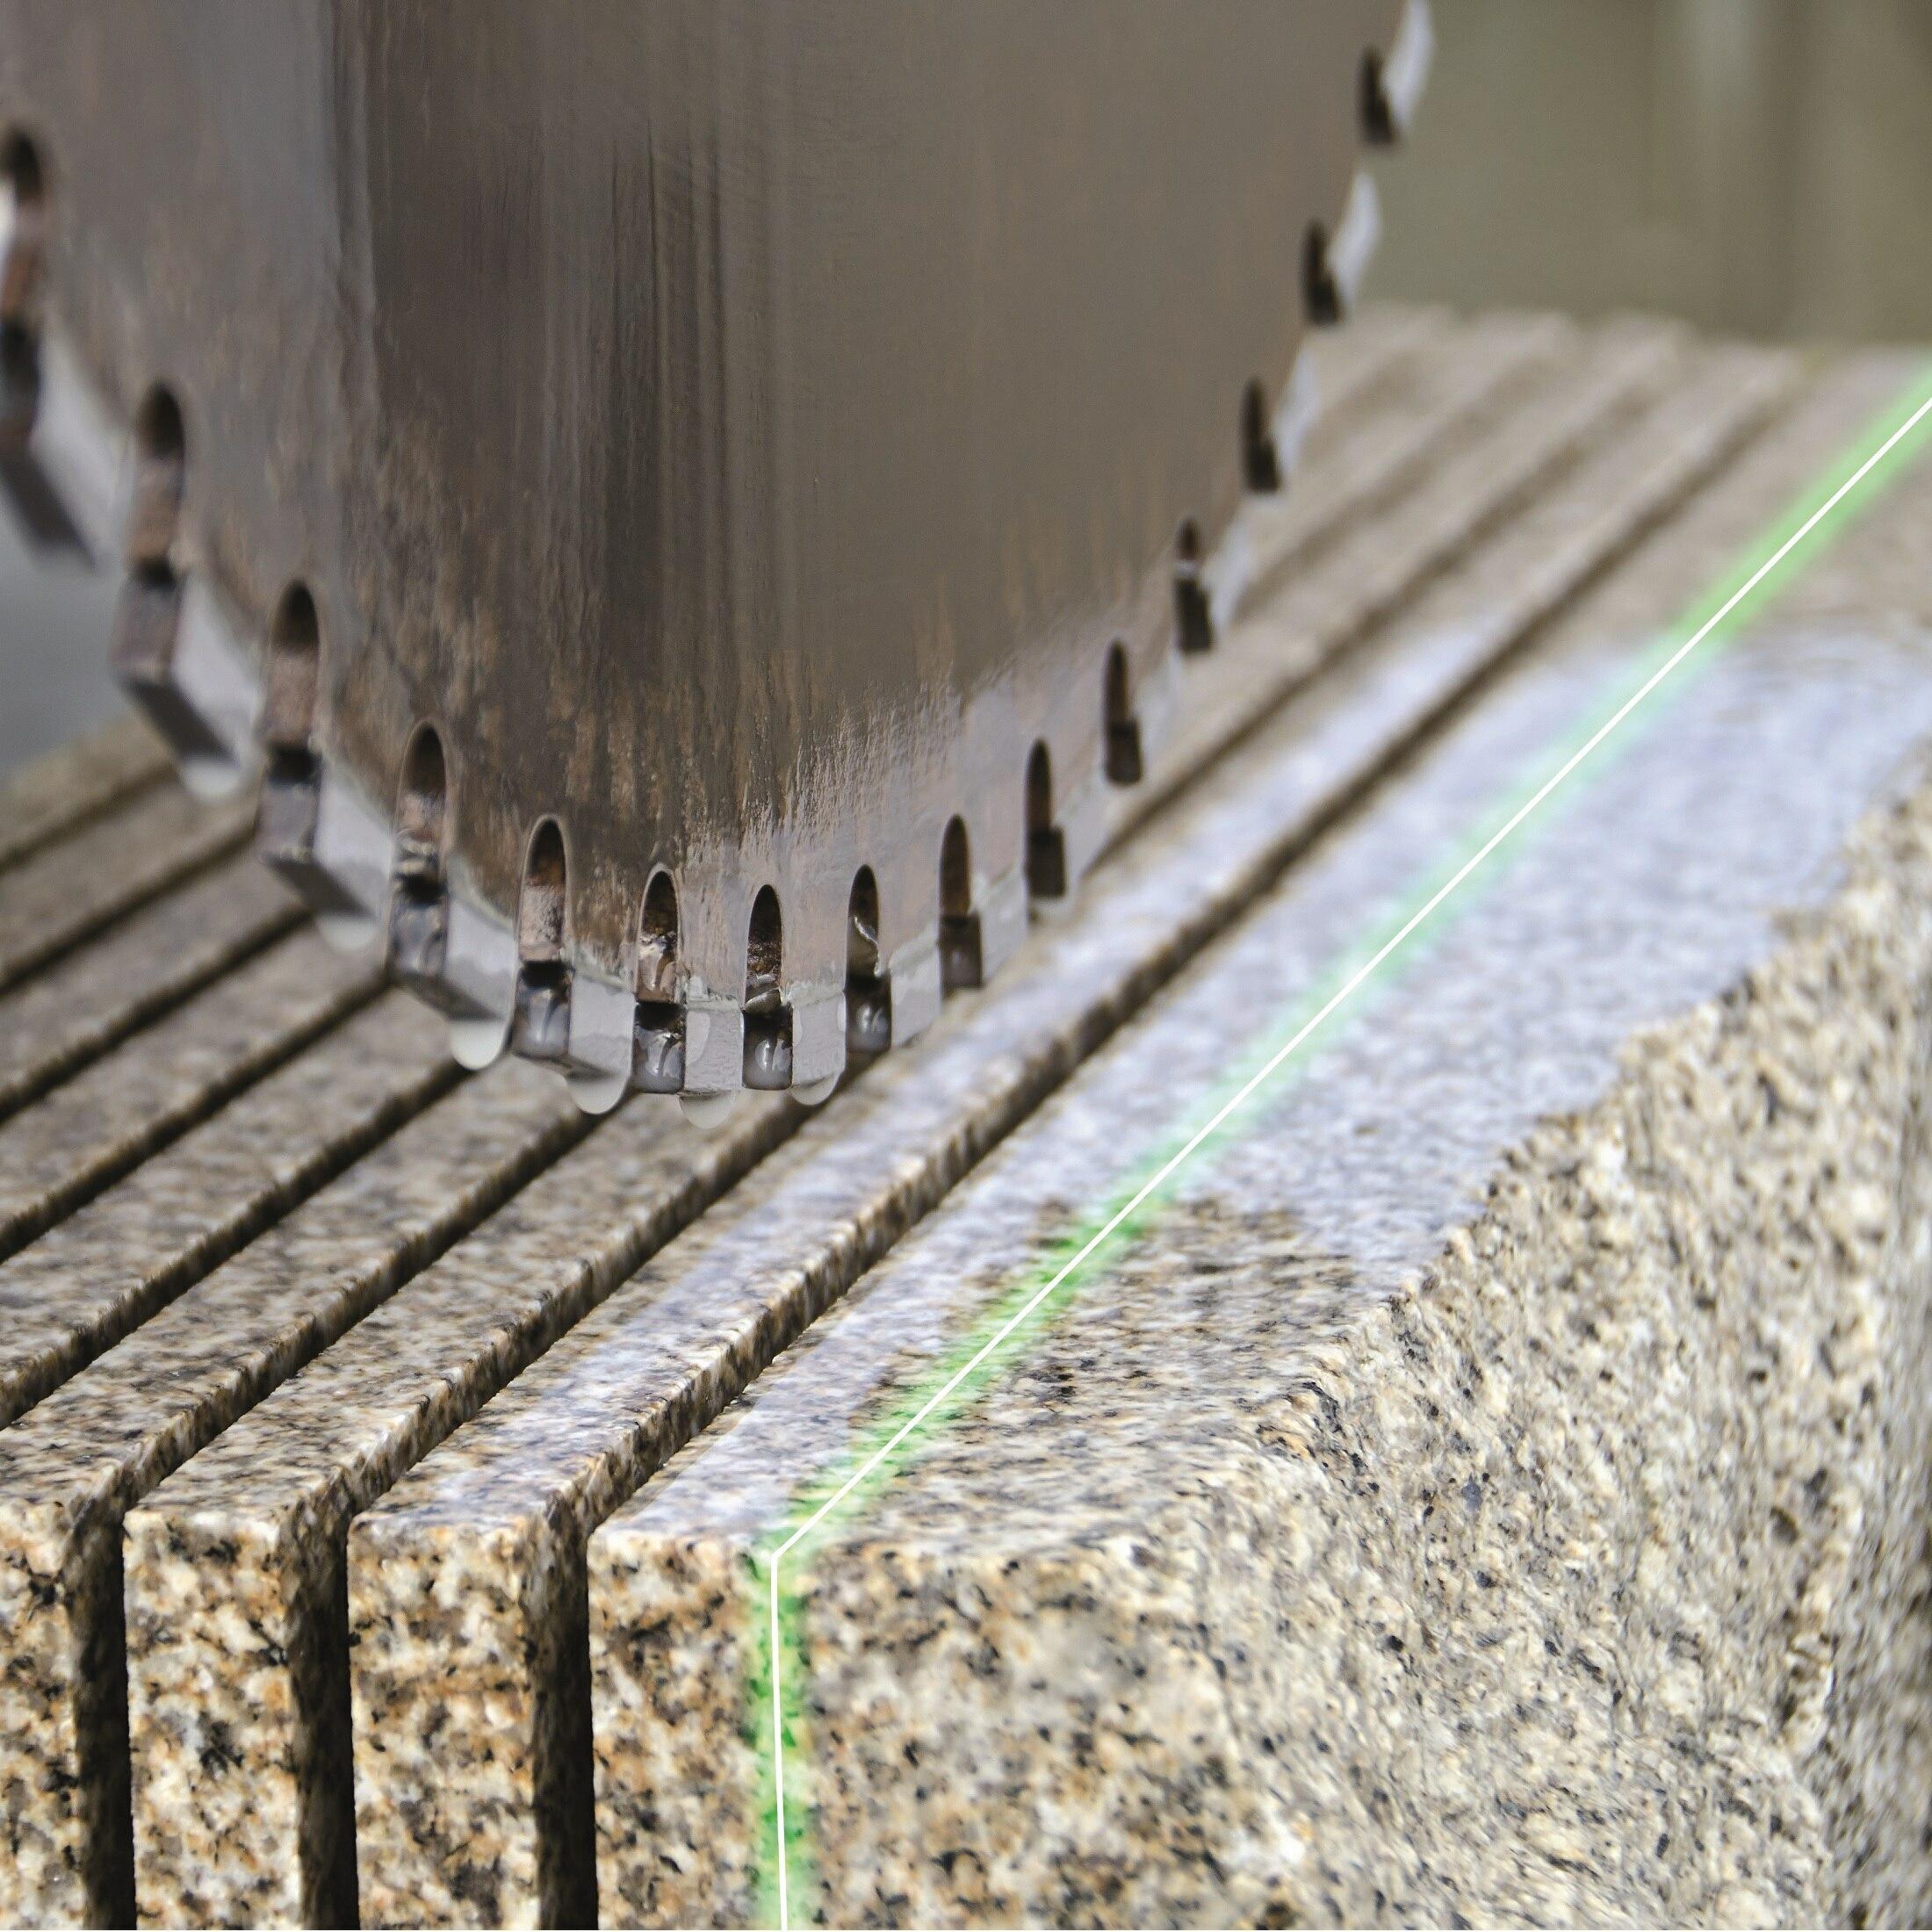 Picotronic Laser MLH520-5-12(22x90)45-F1500